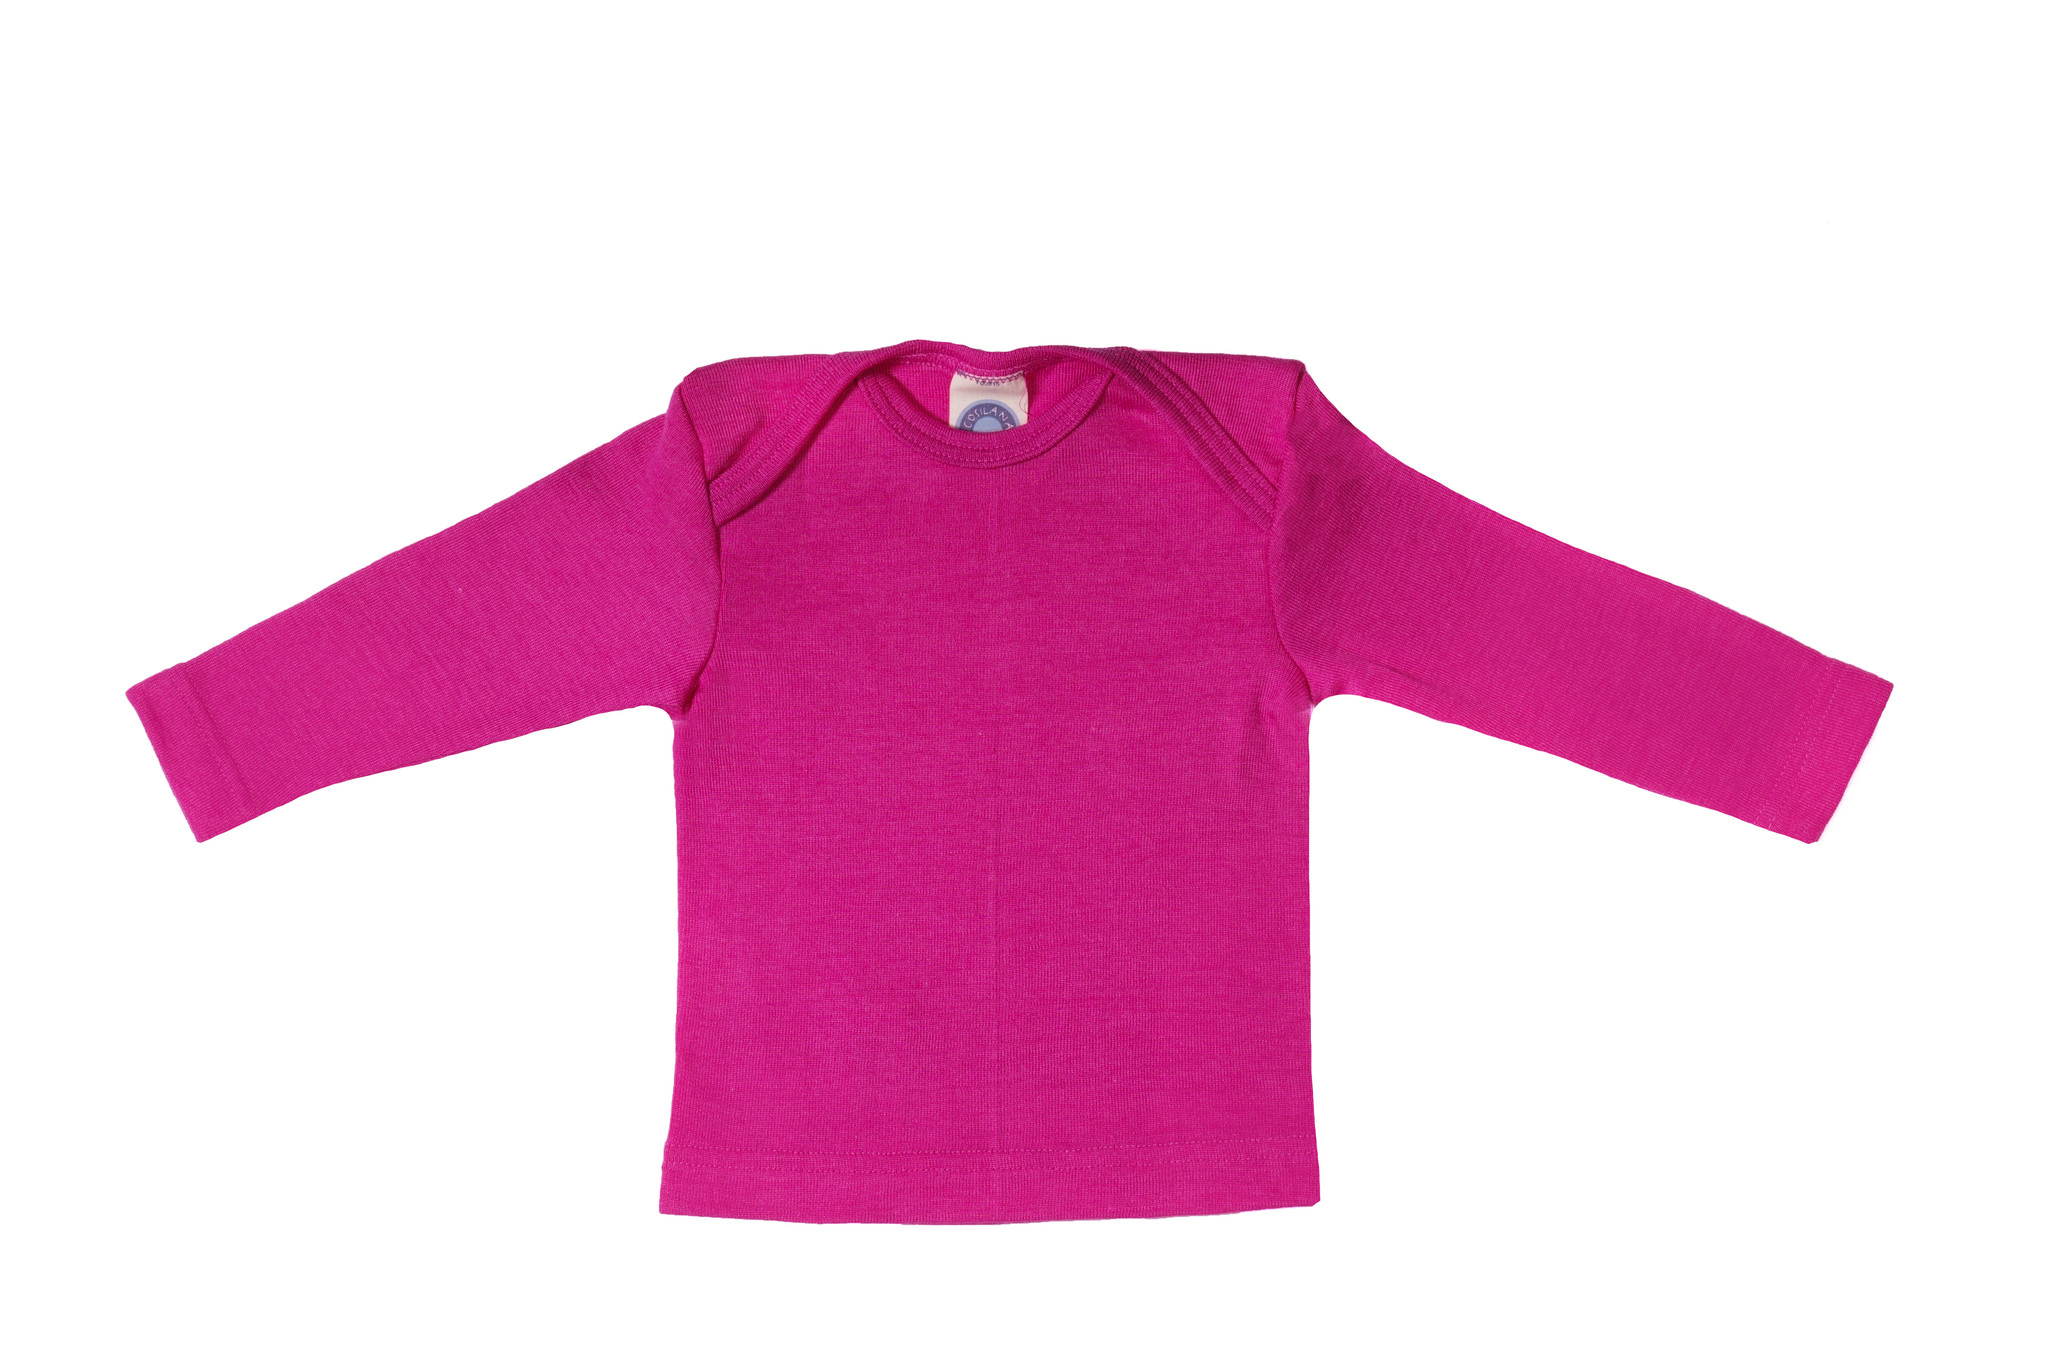 Cosilana Cosilana Babyhemdje Wol/Zijde lange mouw - Roze (30)